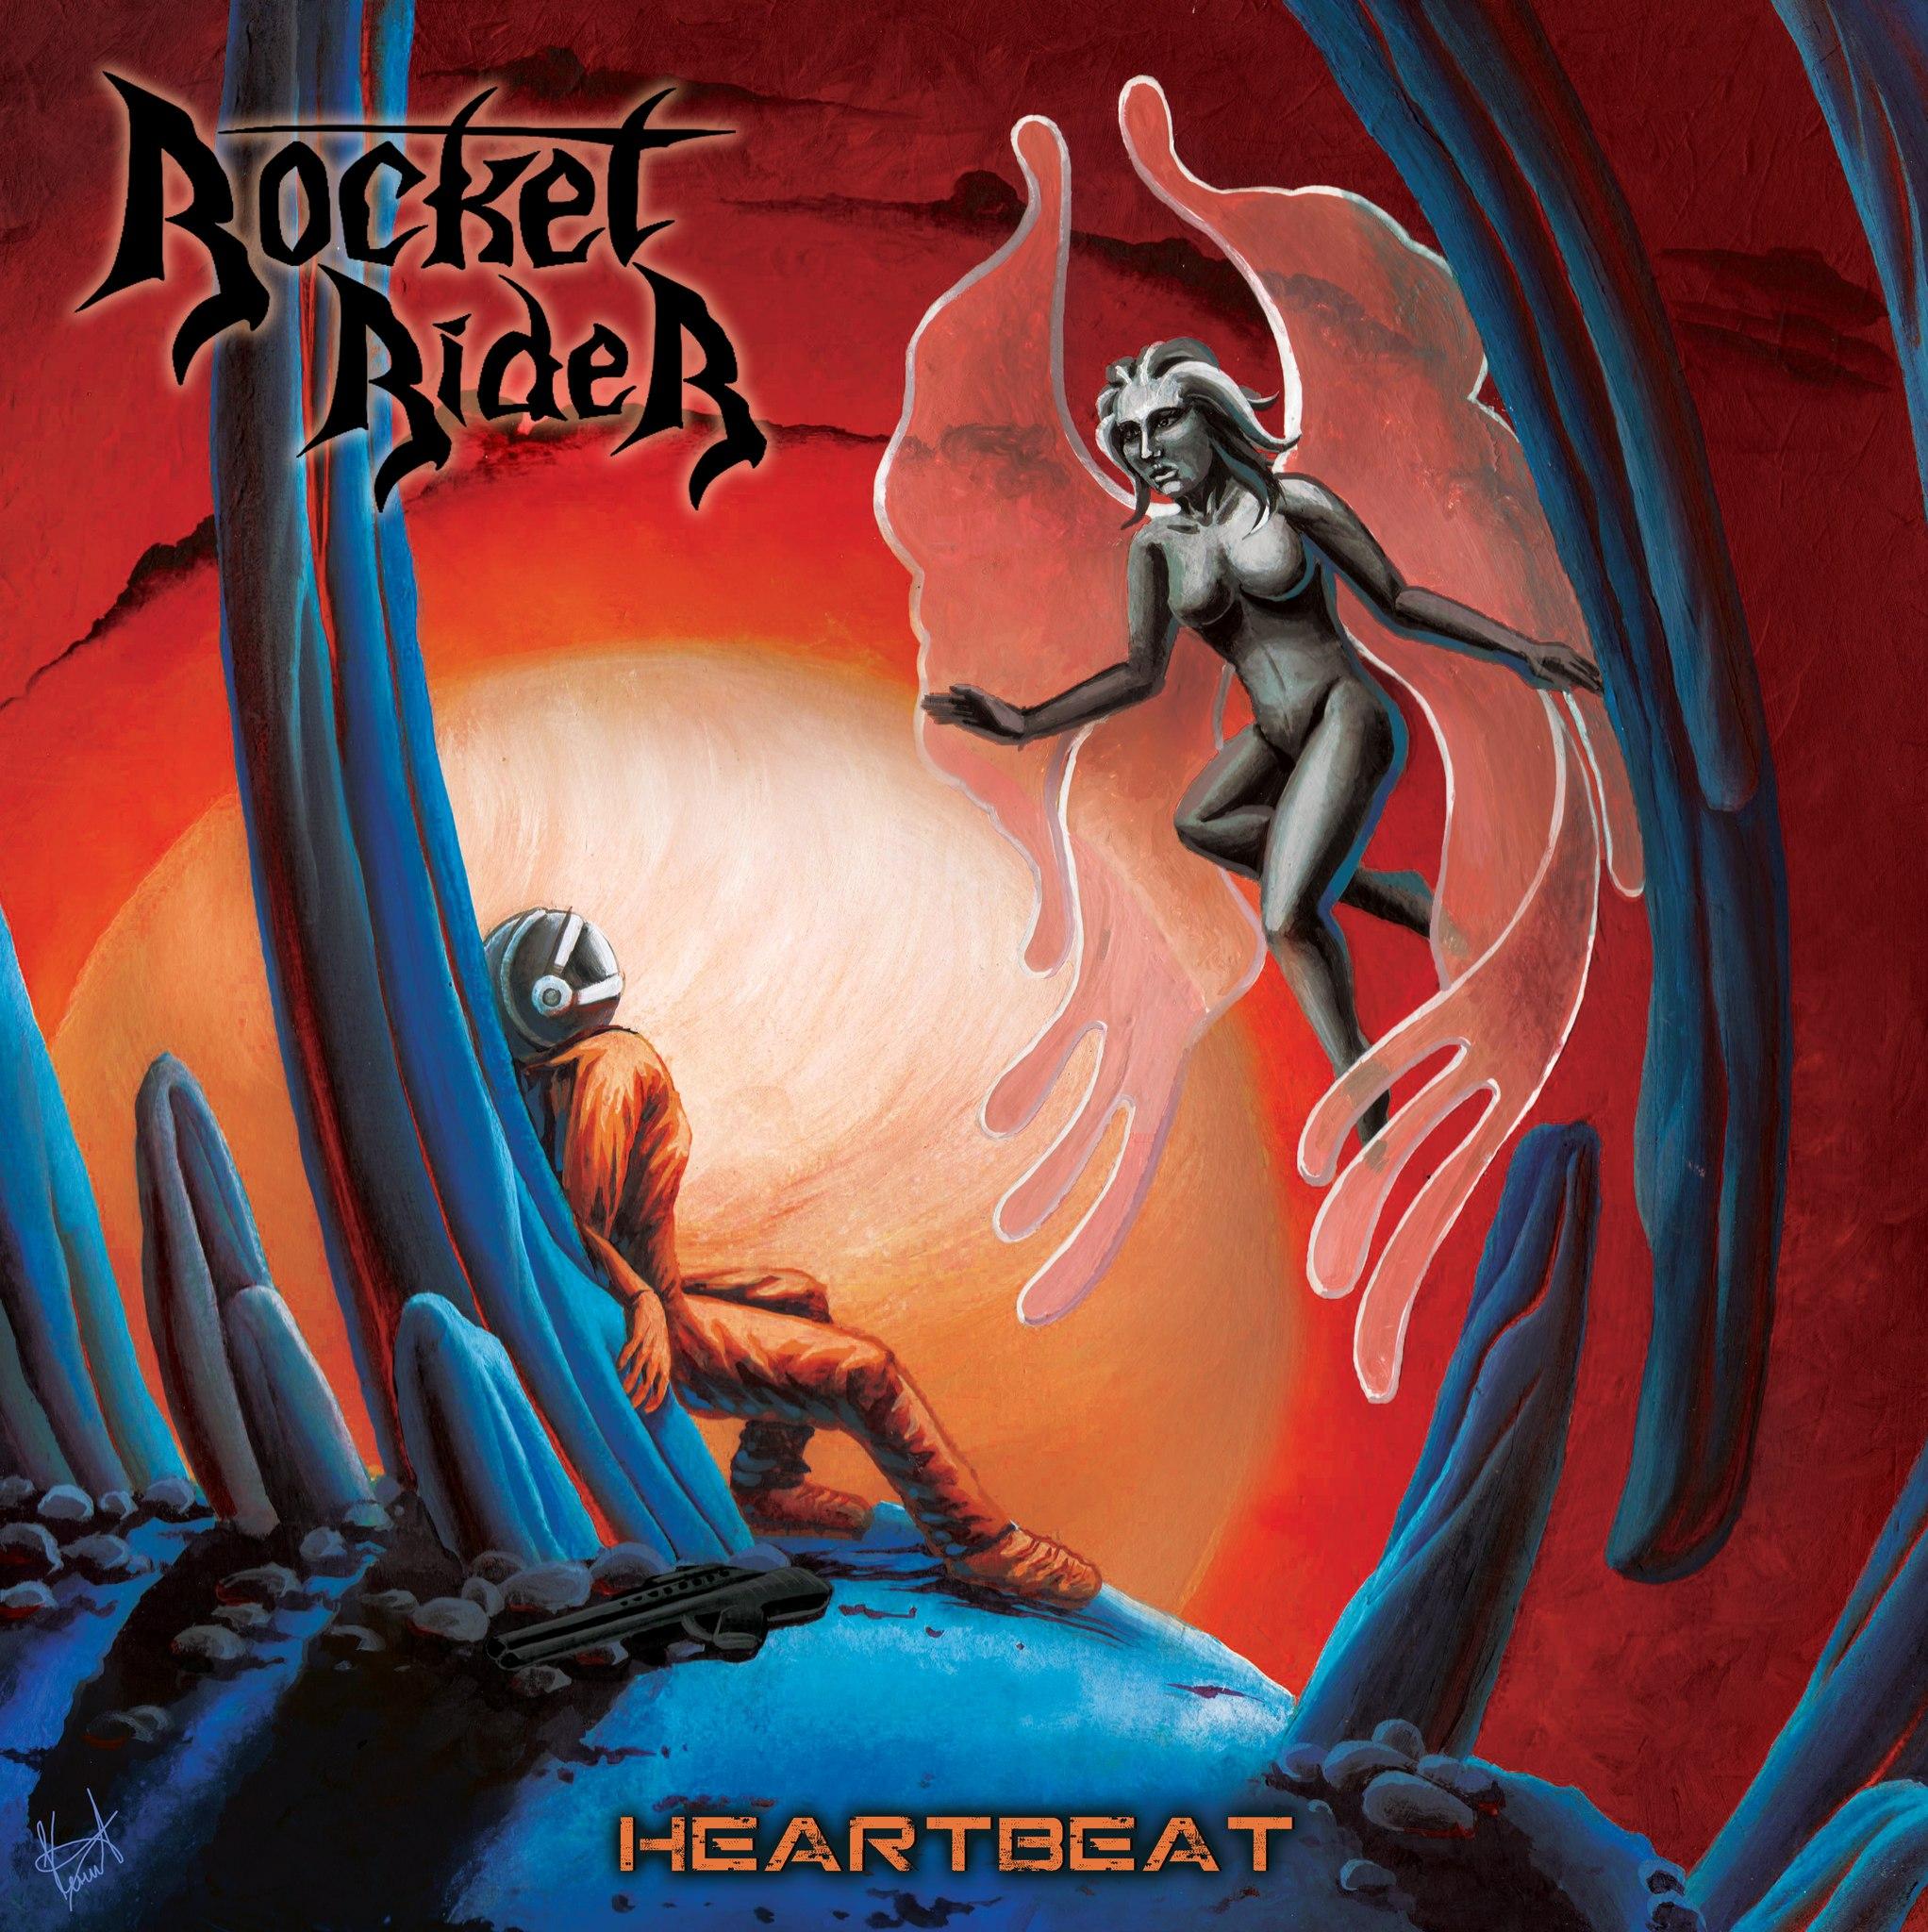 Rocket Rider - Heartbeat